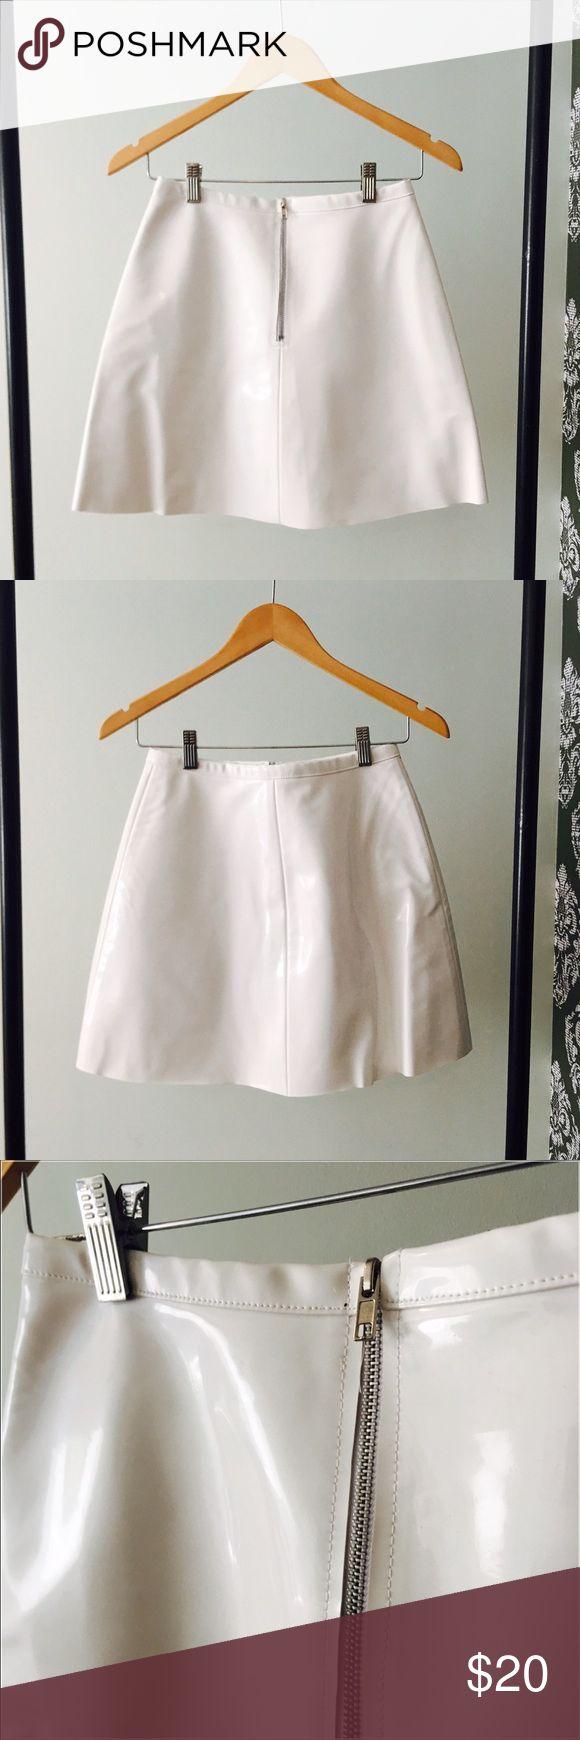 American Apparel White vinyl skirt American Apparel Skirts Mini